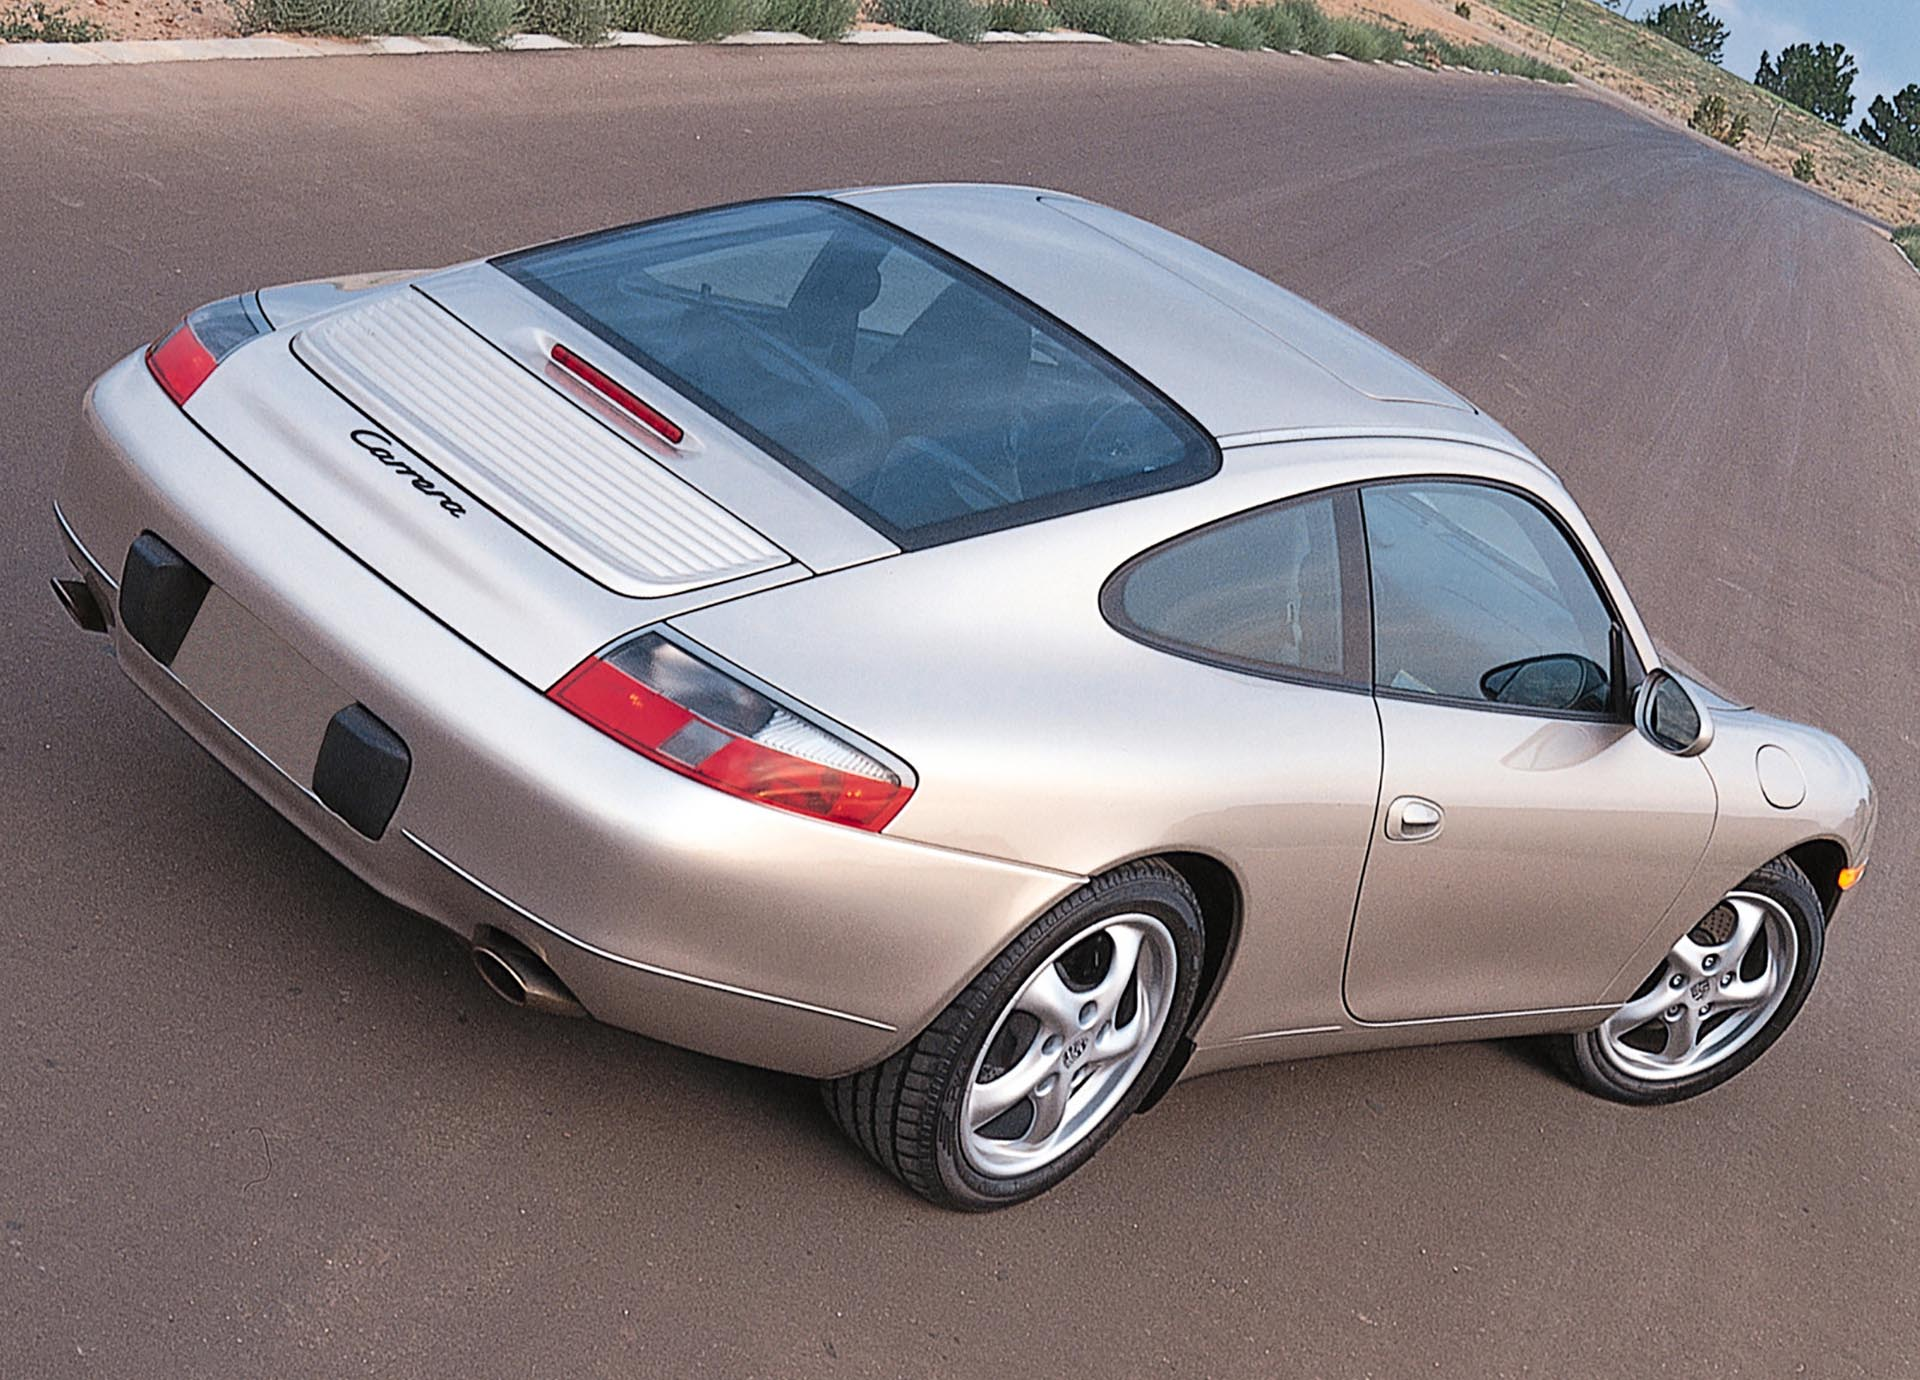 09_Porsche 911 Carrera_Coupe re